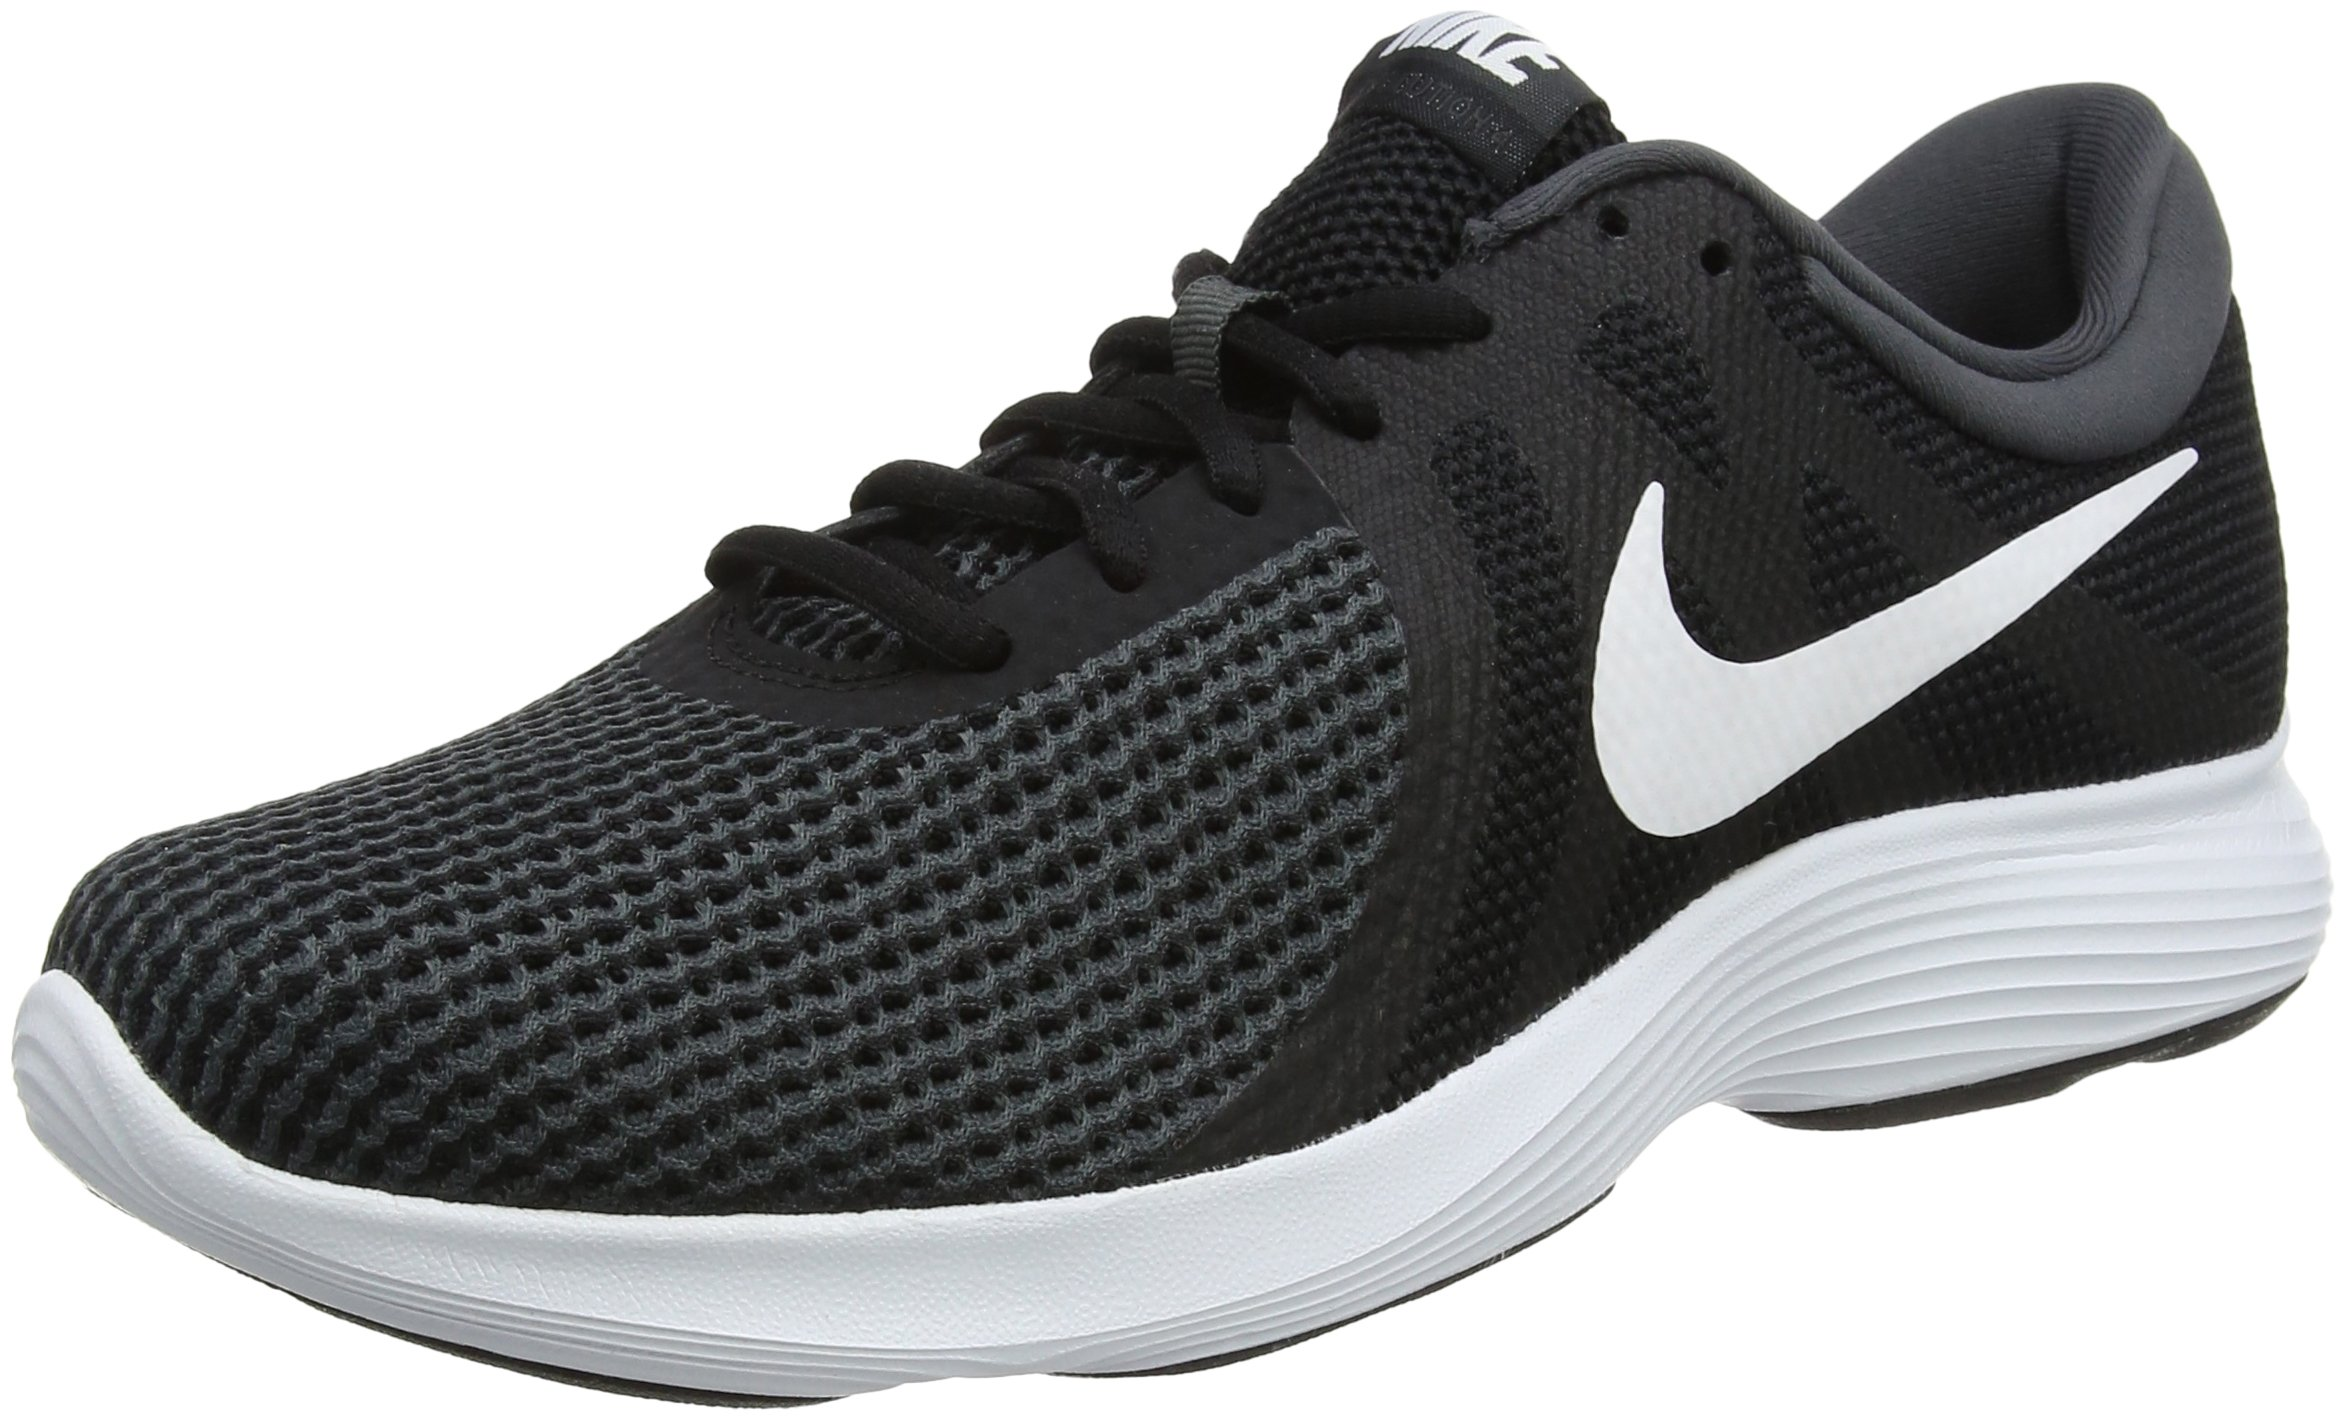 Runner De Nike 2 Zapatillas Para Hombre Running Md xrxFw45